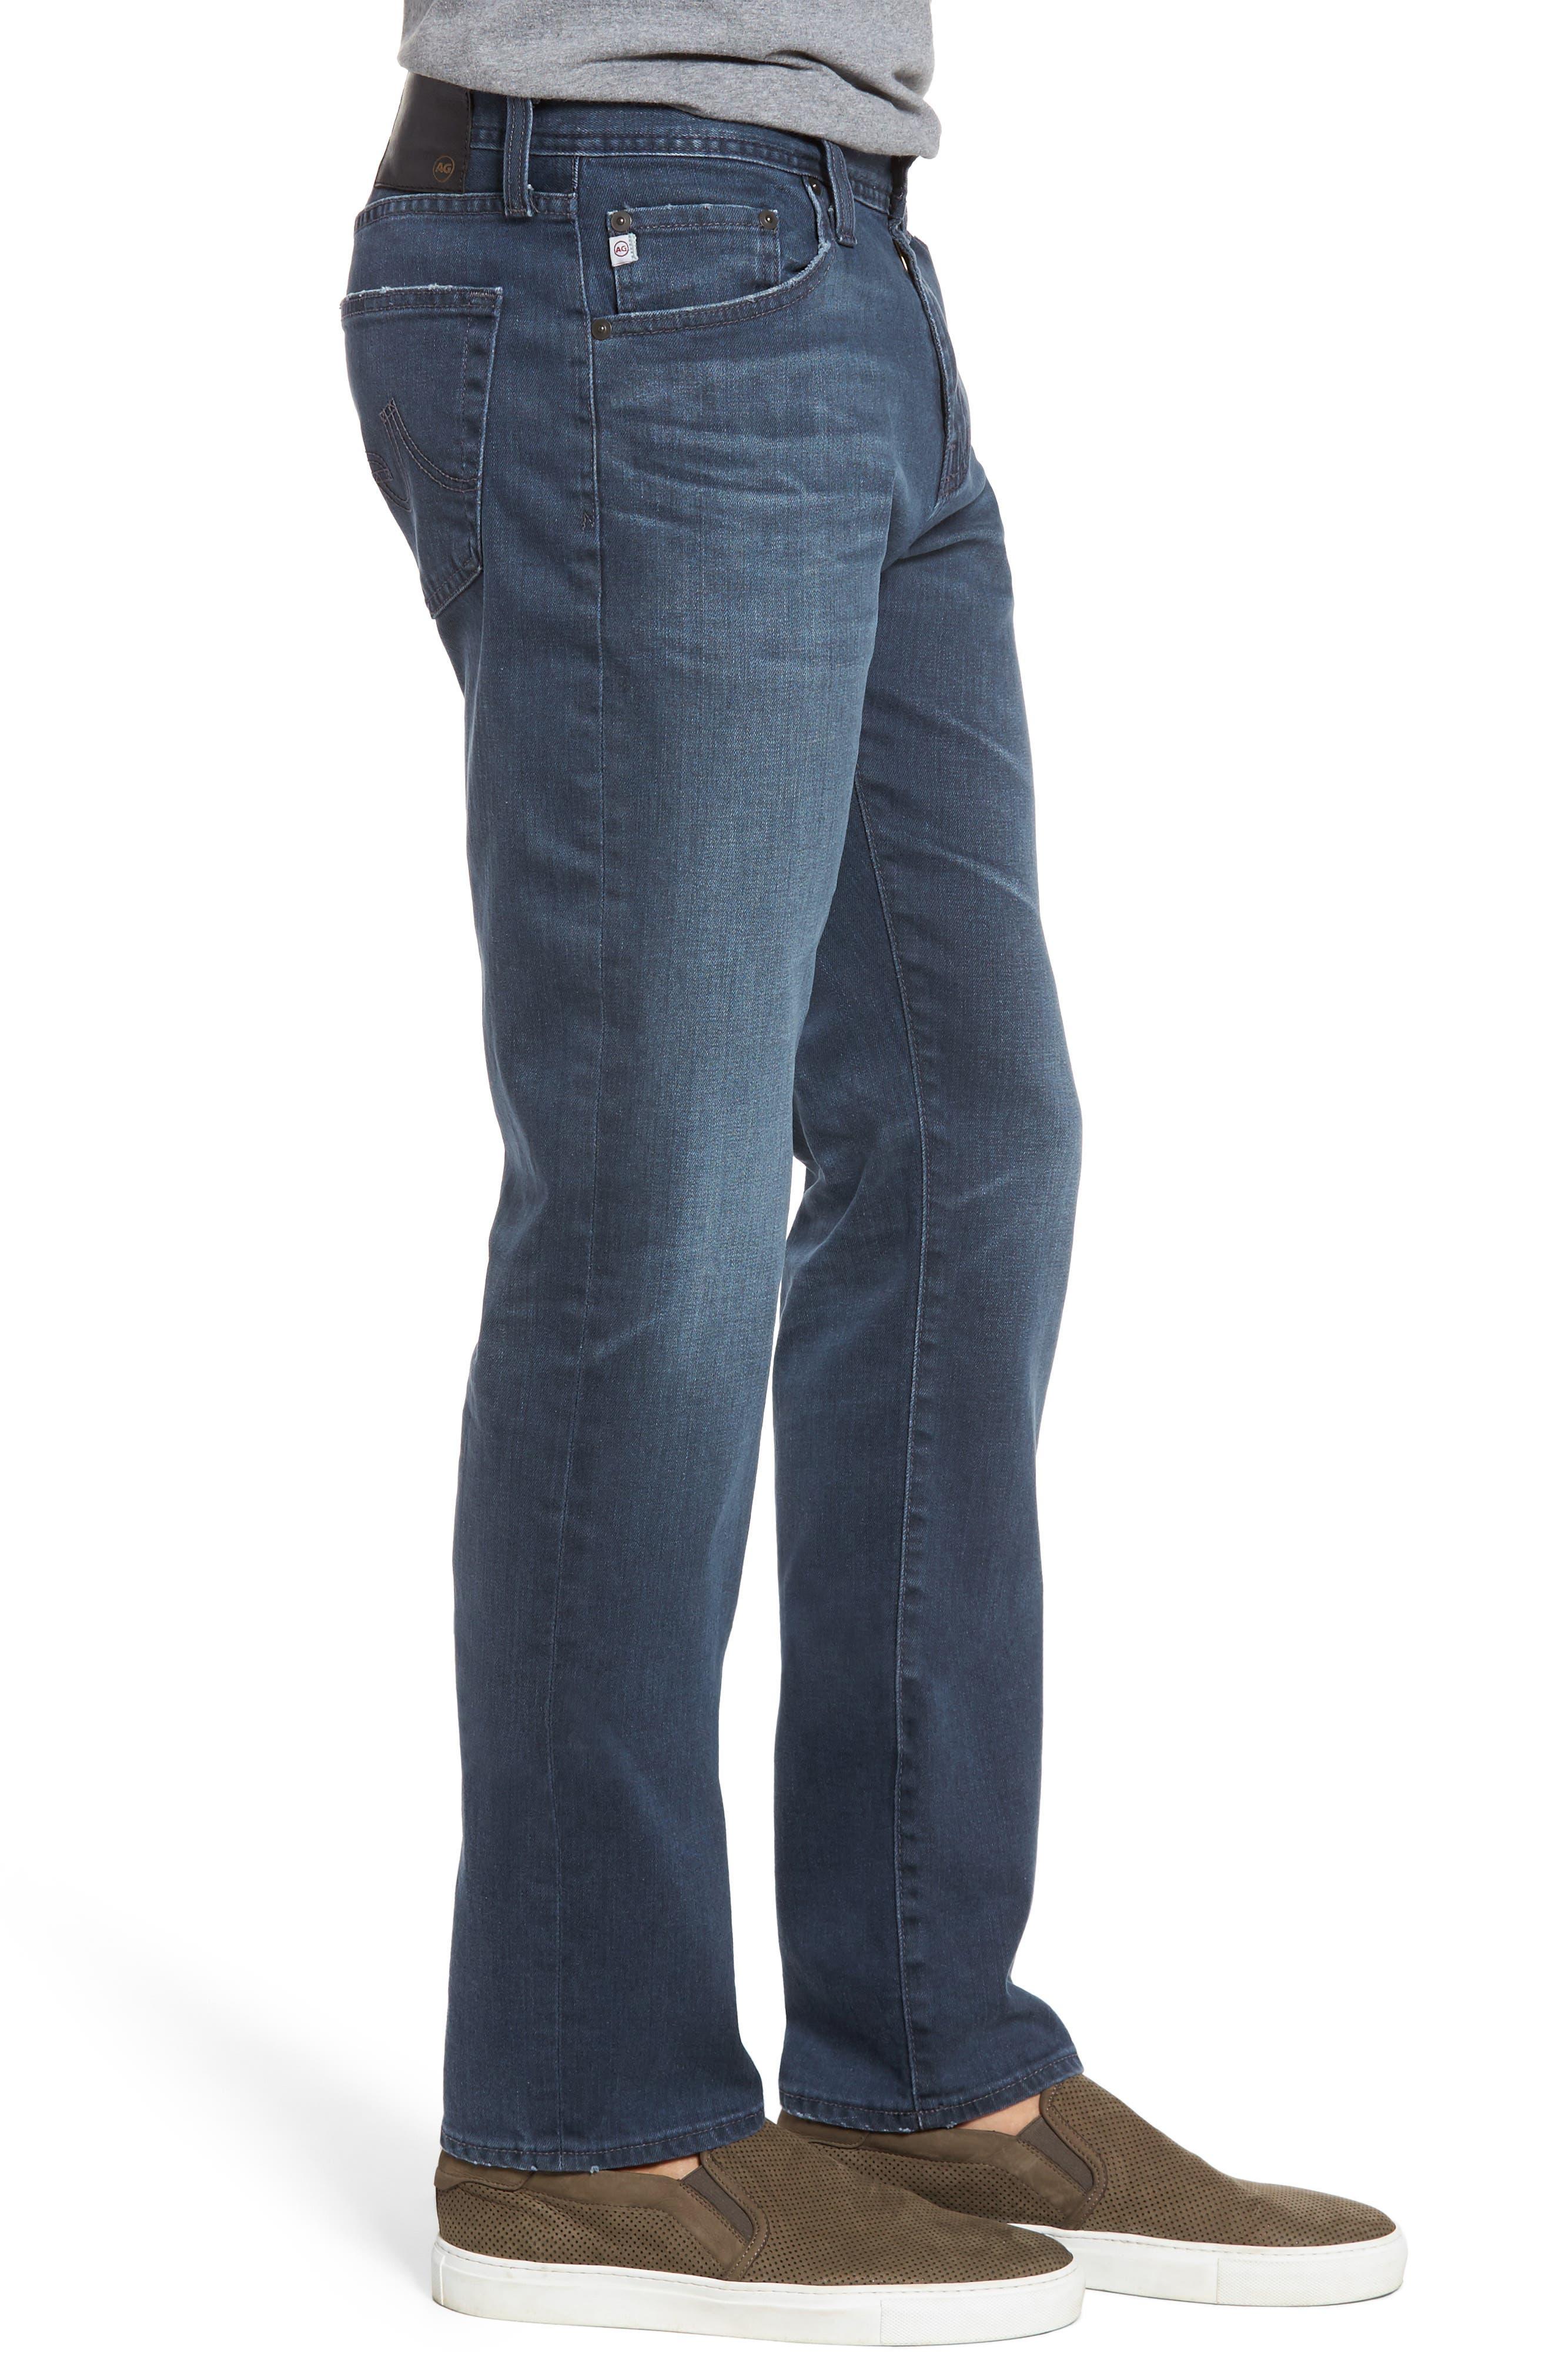 Graduate Slim Straight Leg Jeans,                             Alternate thumbnail 3, color,                             7 YEARS BLUE PERIL